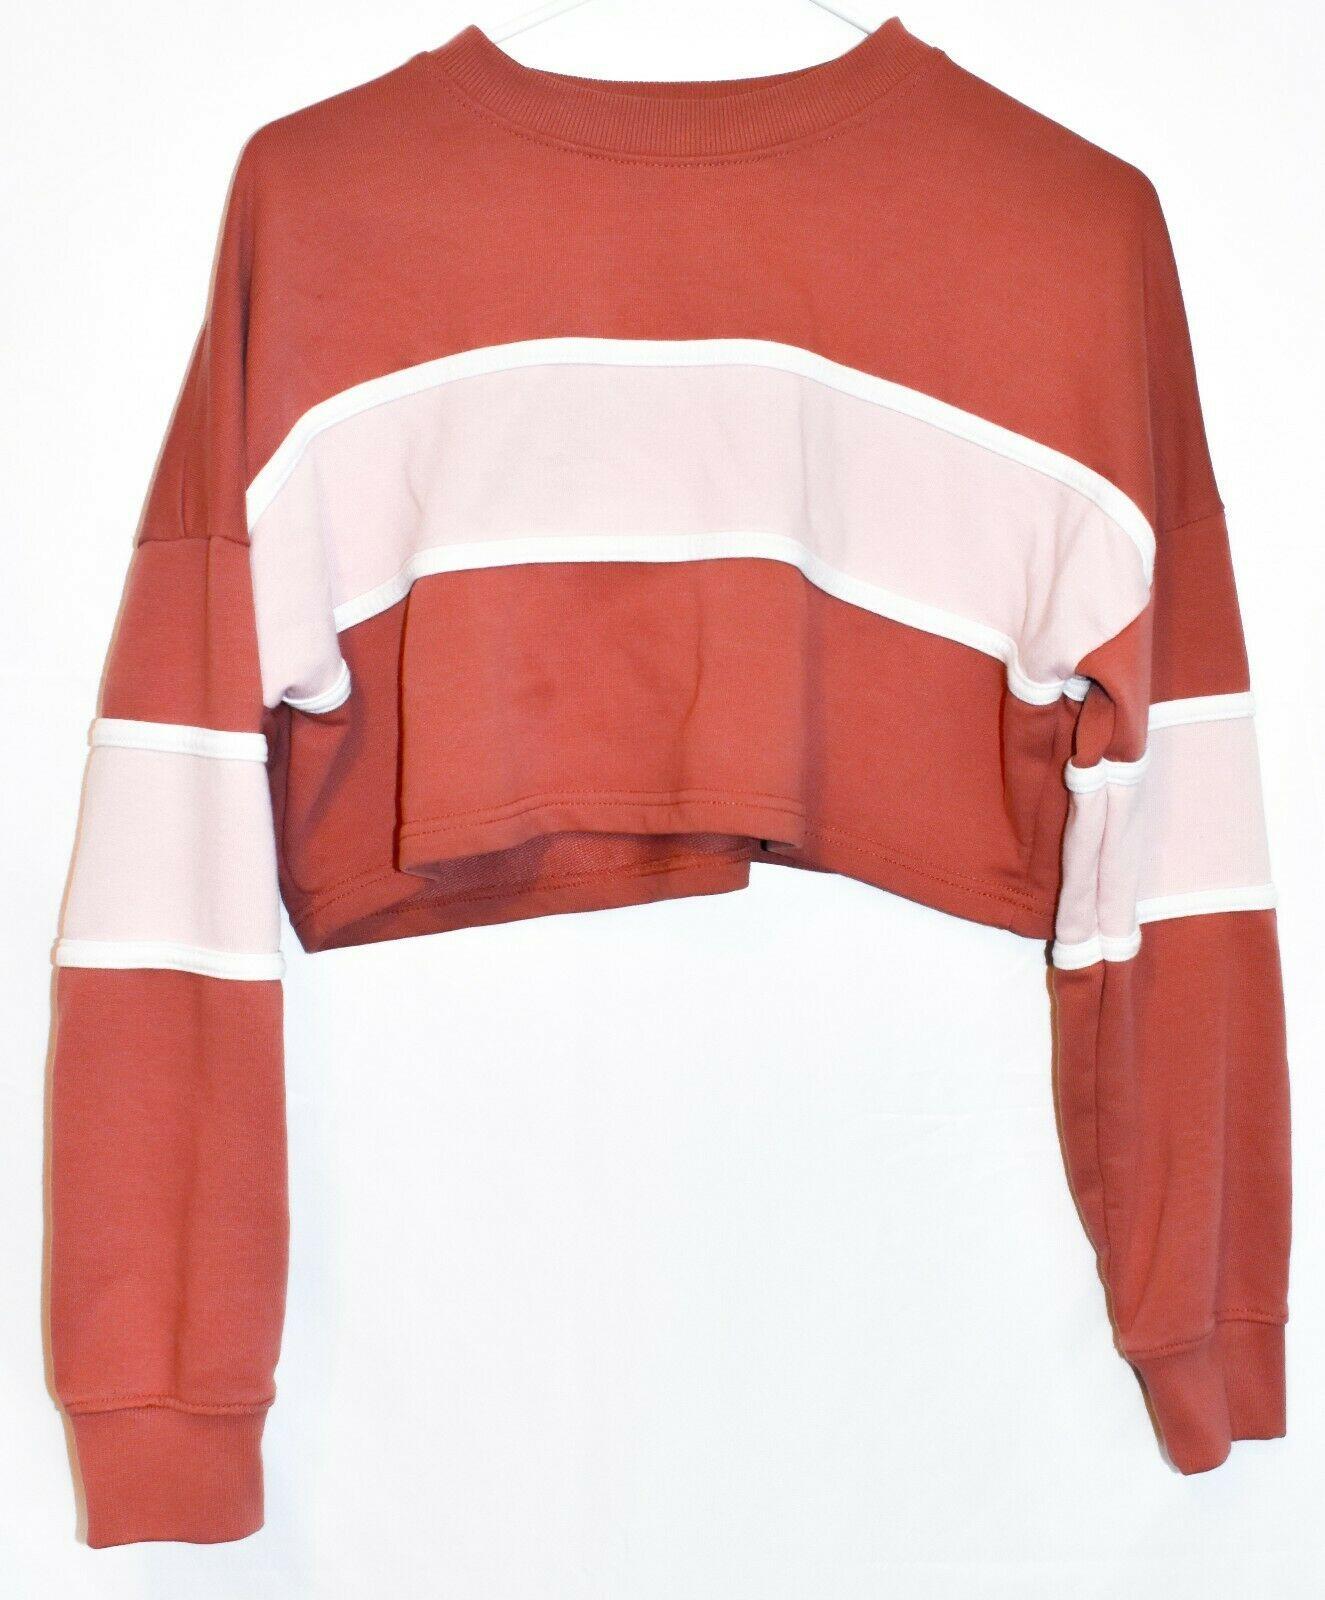 Missguided Women's Pink Rose Striped Color Block Crop Sweatshirt Size 2